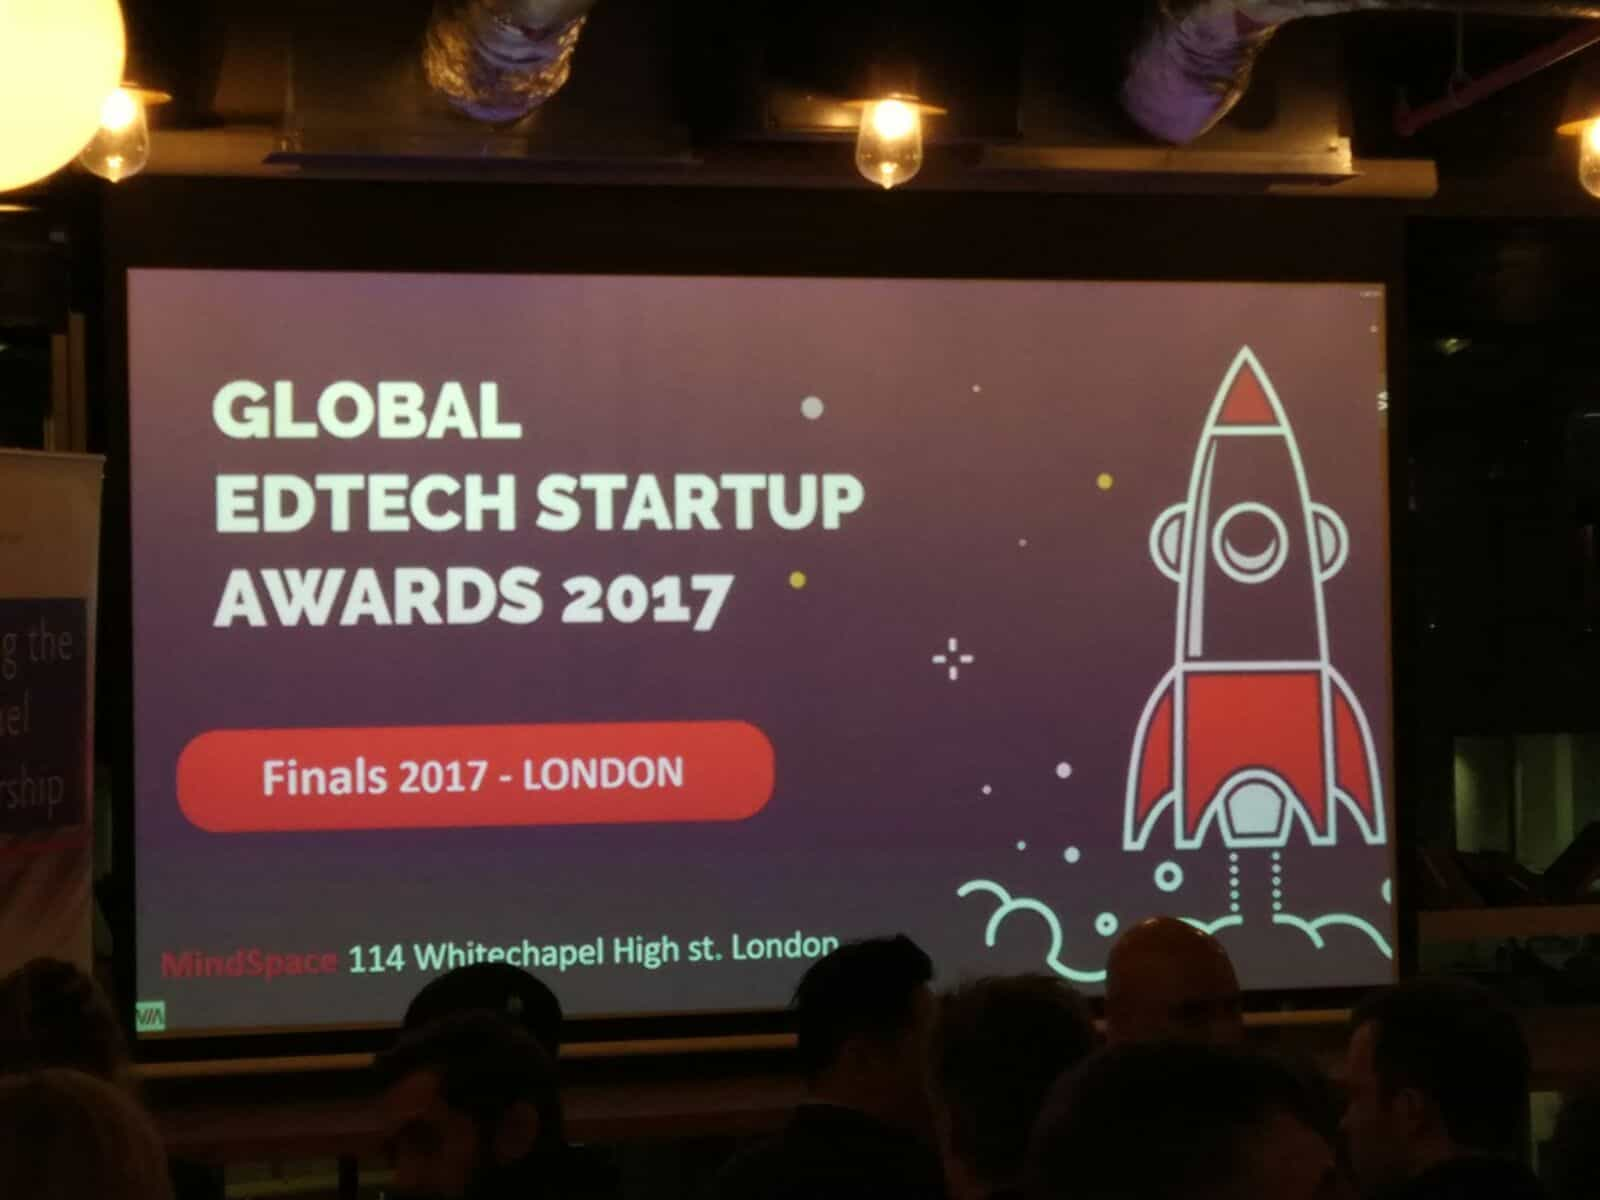 GLOBAL EDTECH STARTUP AWARDS 2017